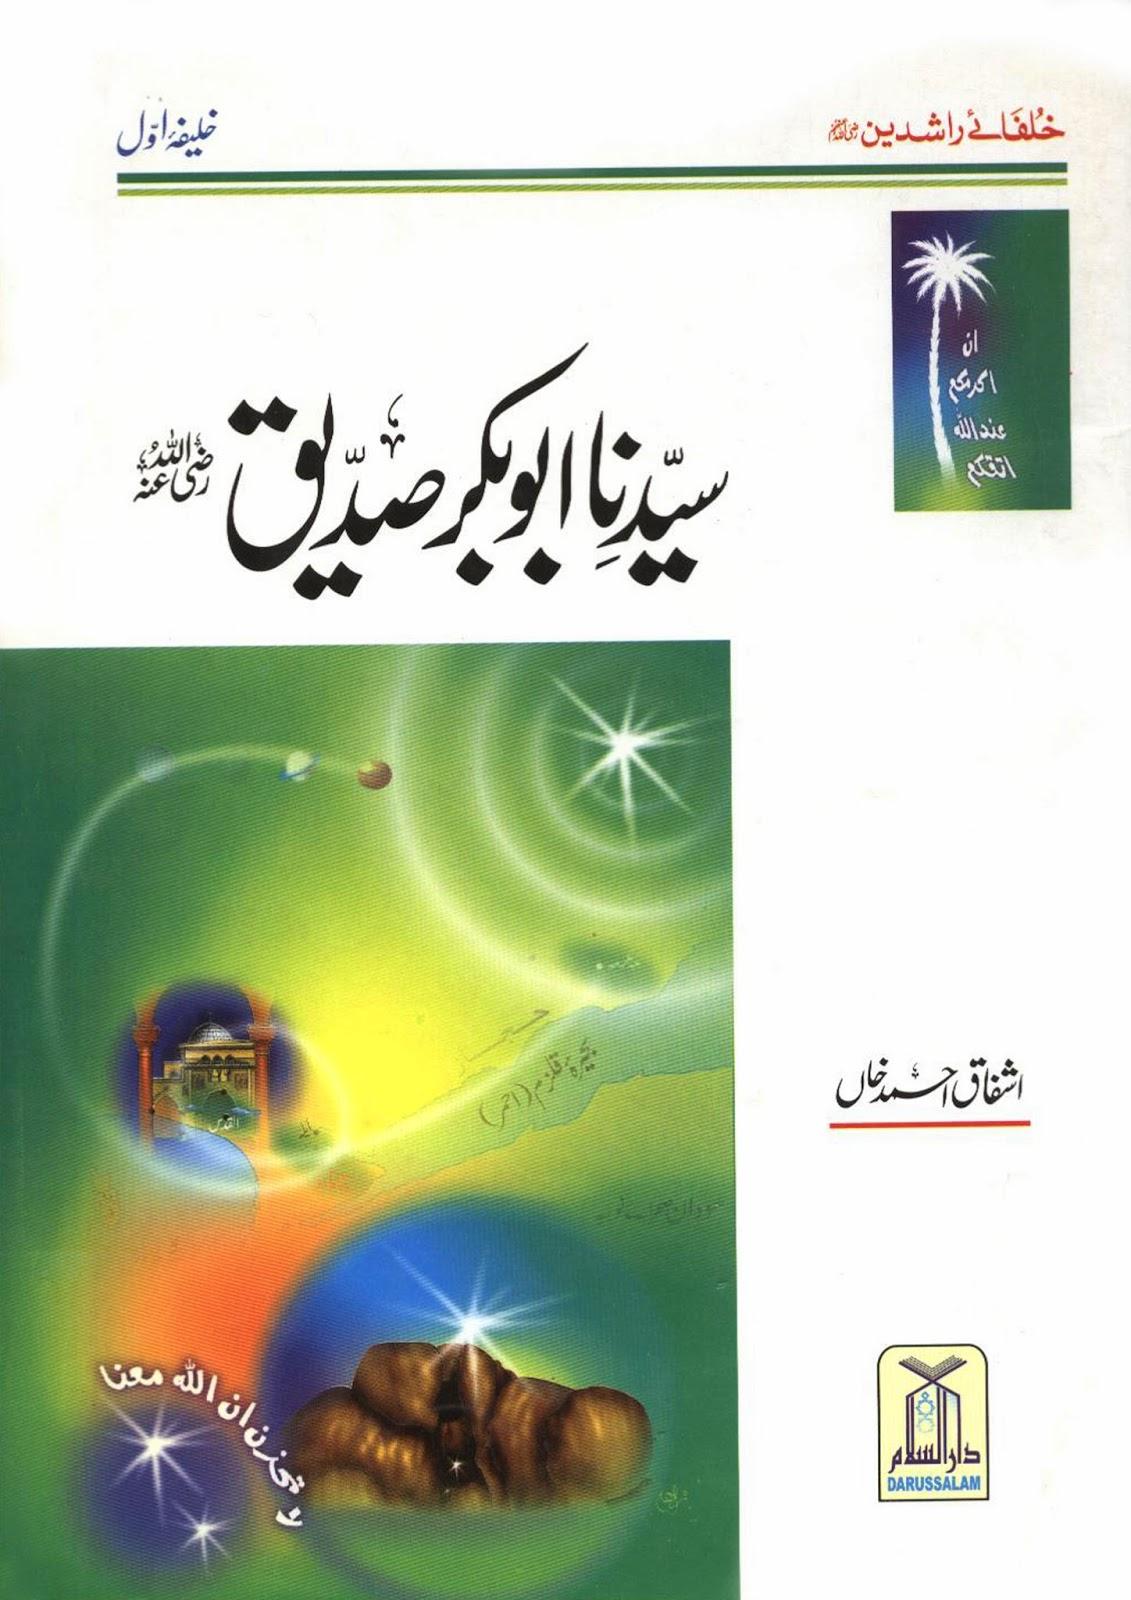 http://urduguru1.blogspot.com/2014/02/khalifa-e-awwal-abu-bakar-siddiq-razi.html